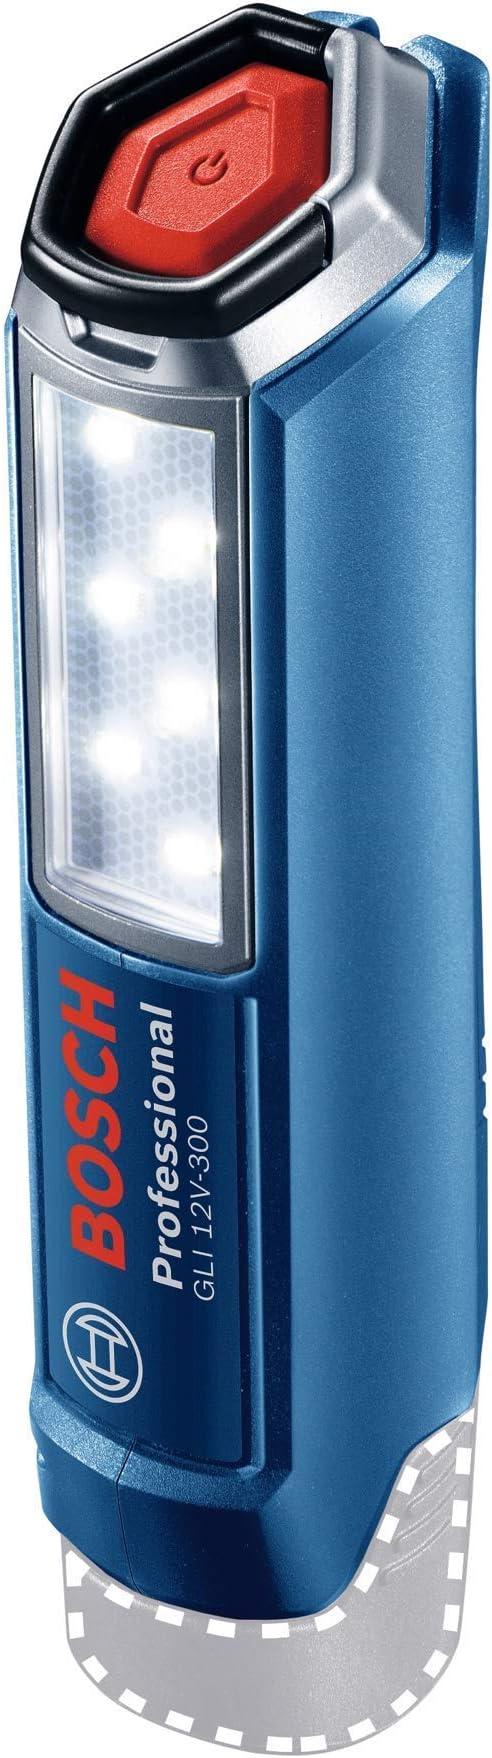 506 opinioni per Bosch Professional 12V System Luce a LED a batteria GLI 12V-300 (300 Lumen,